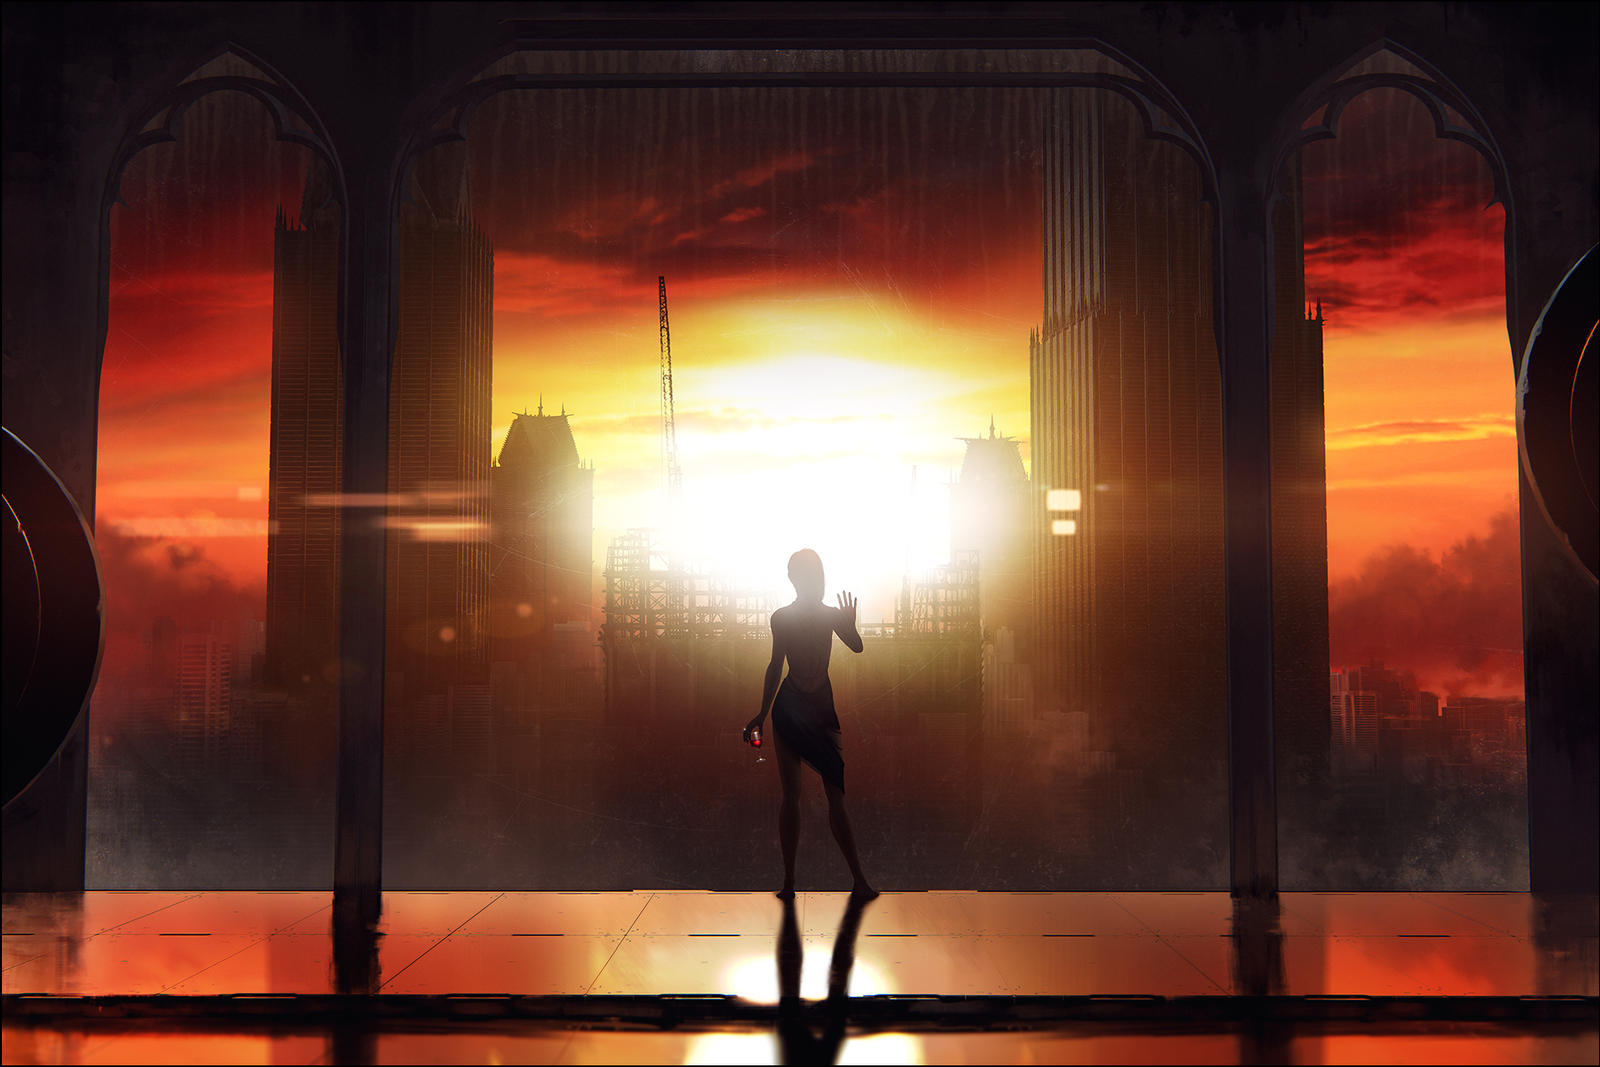 ARCHON: The Setting Sun by JLarenART